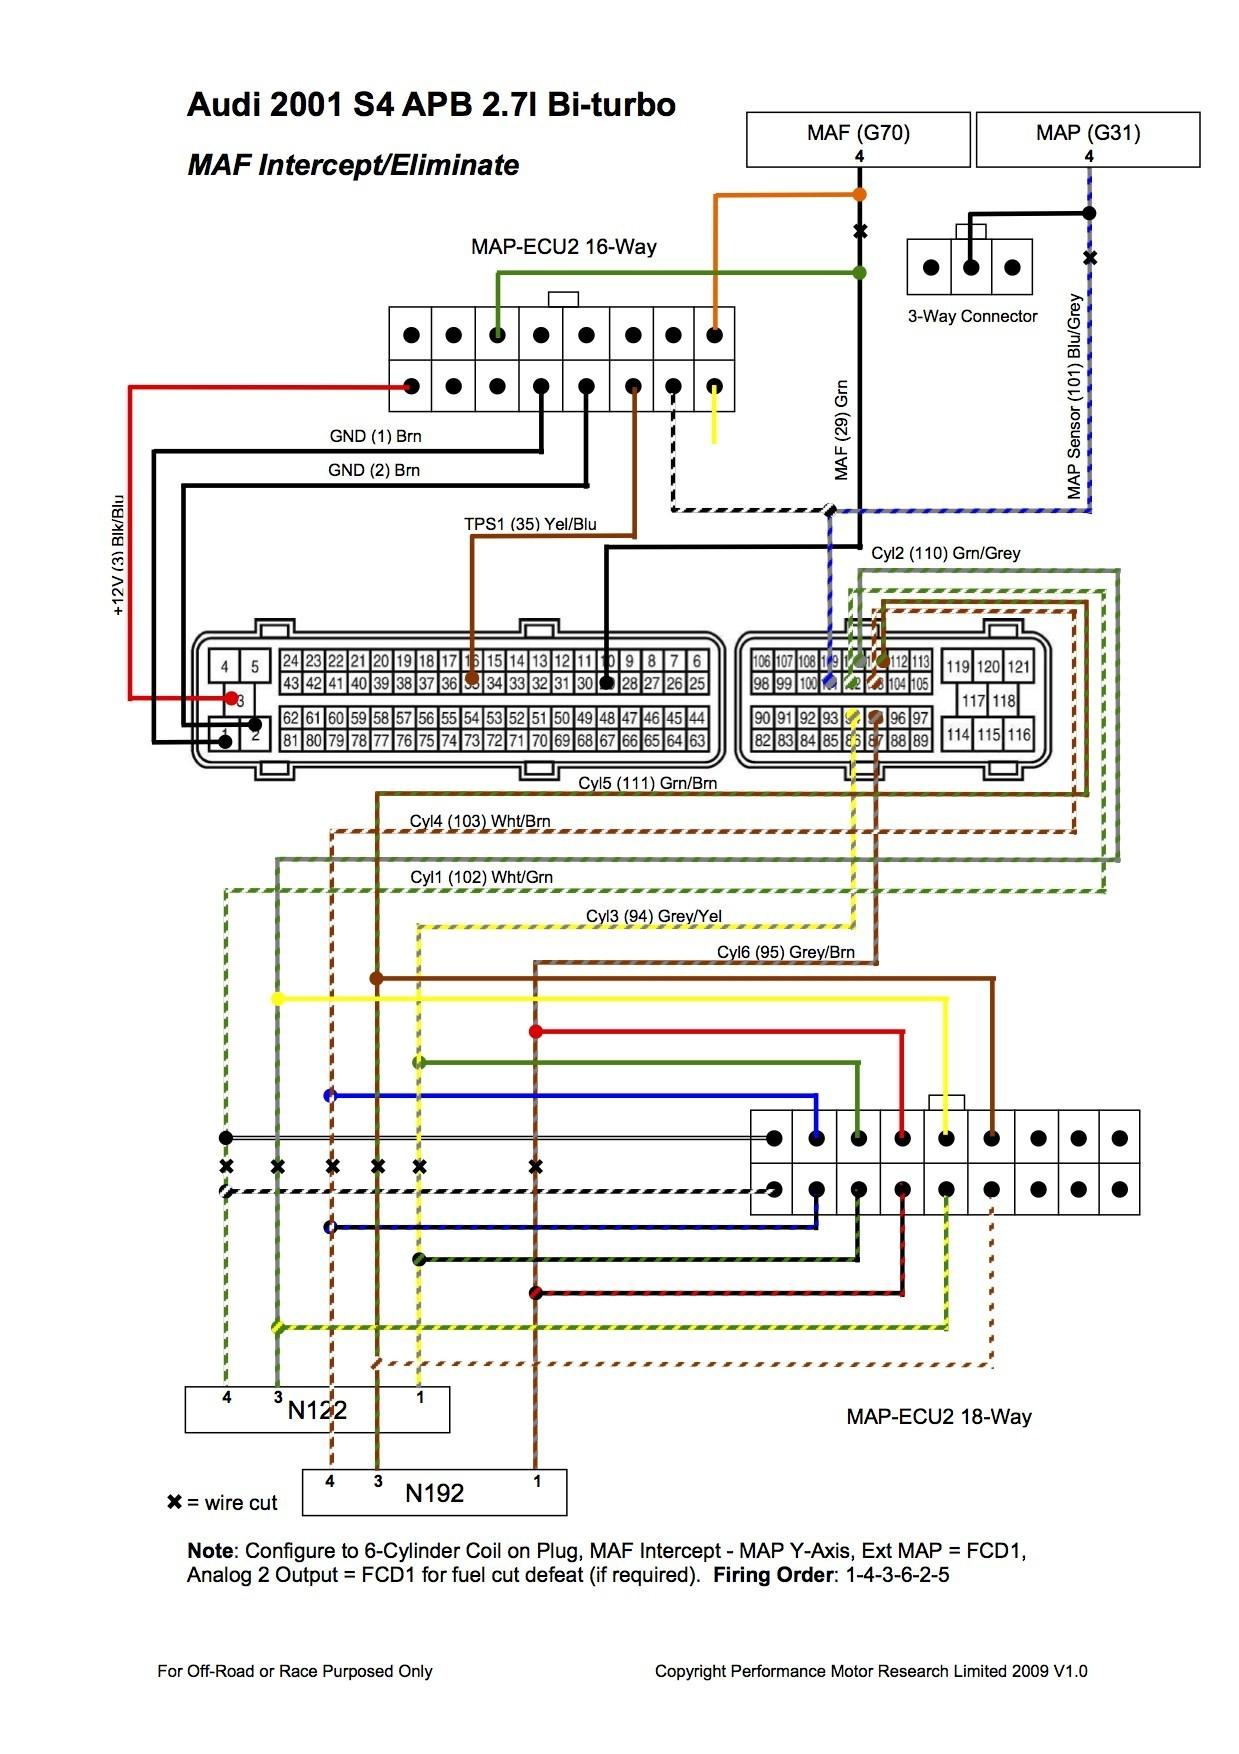 92 dodge caravan wiring diagram wiring diagram automotive